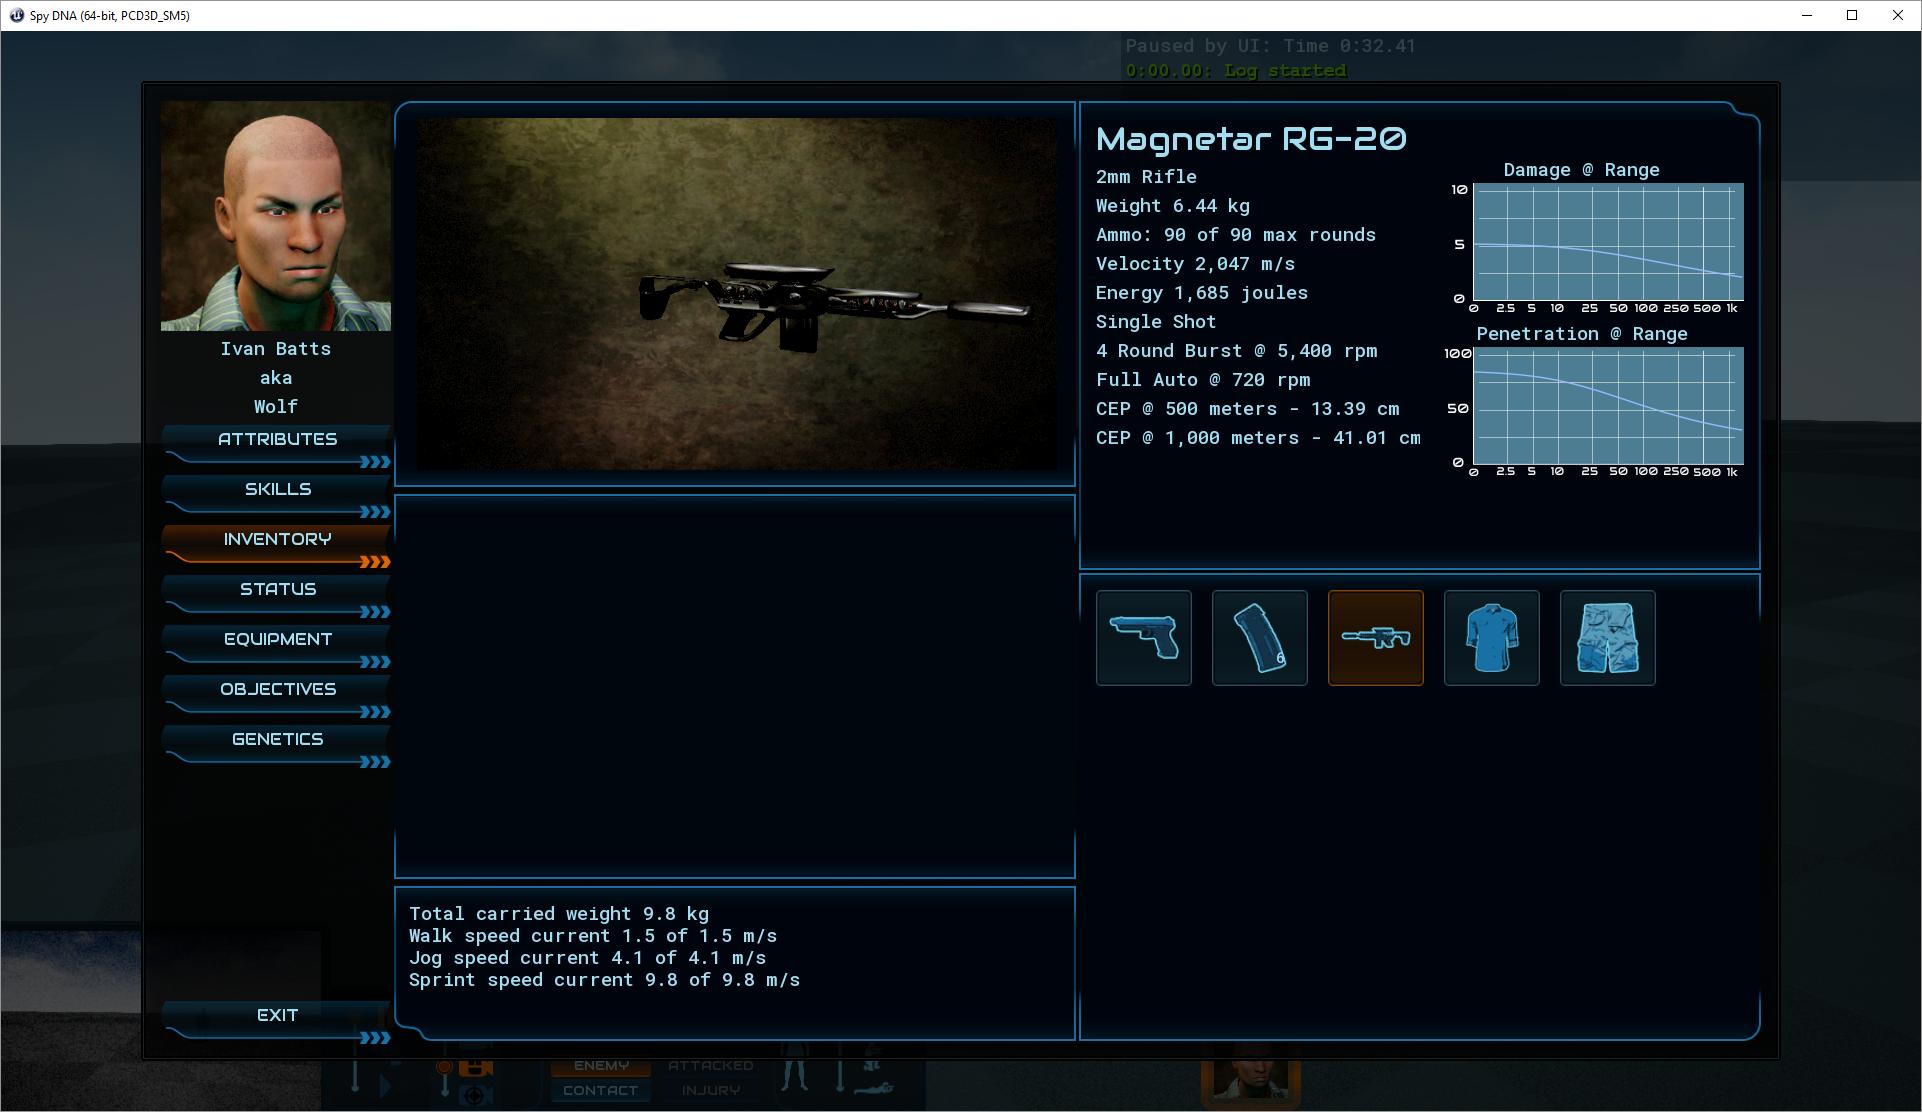 Inventory screenshot